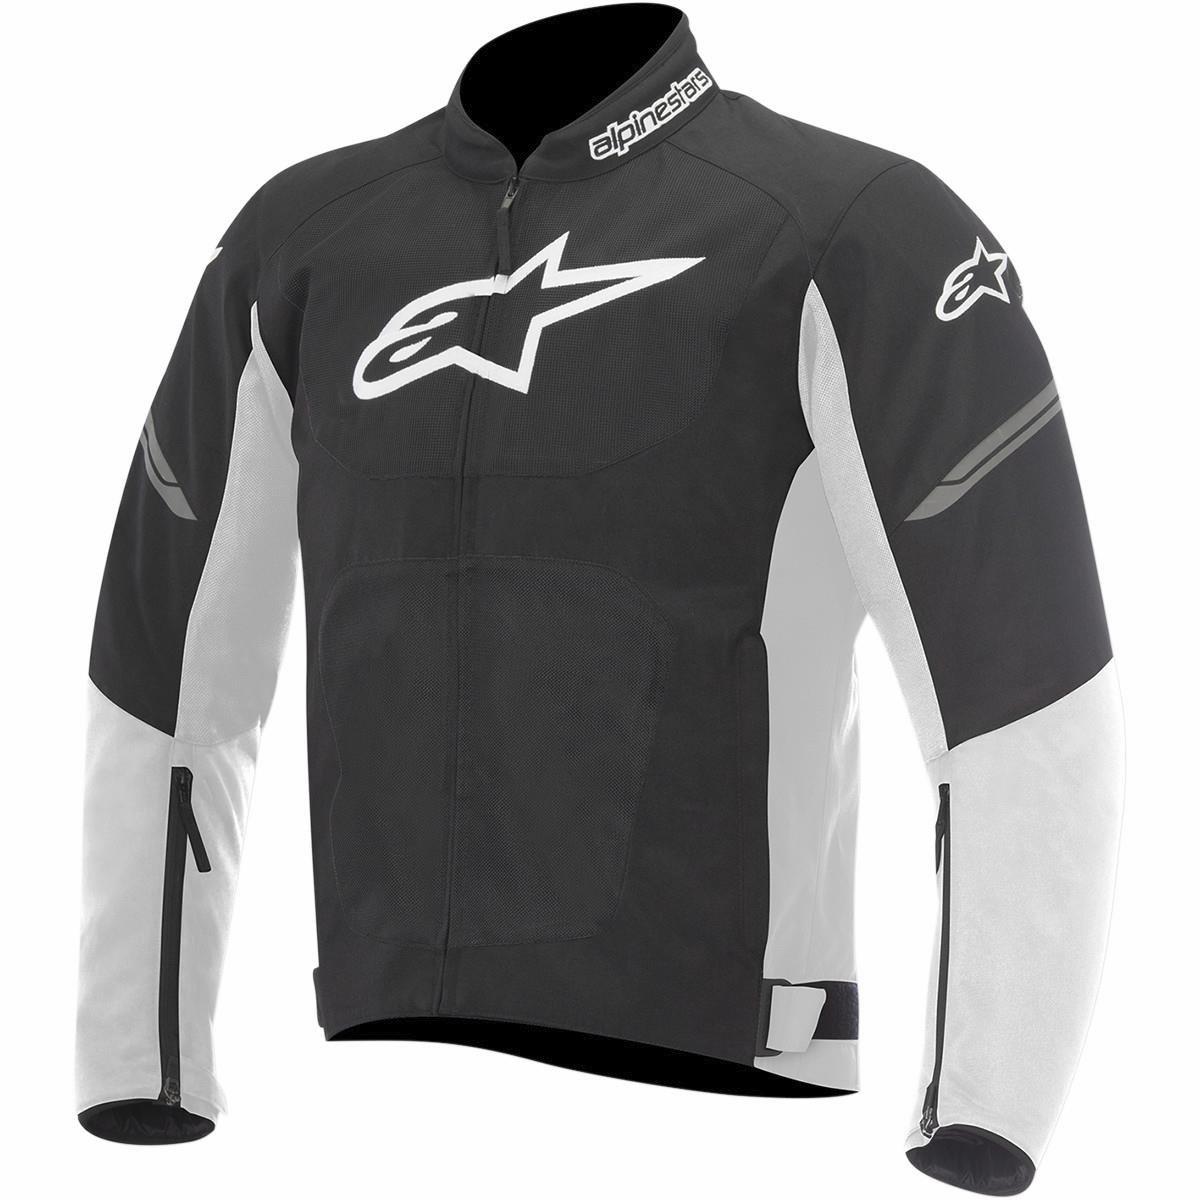 Alpinestars Viper Air Jacket (XXXX-LARGE) (BLACK/WHITE)